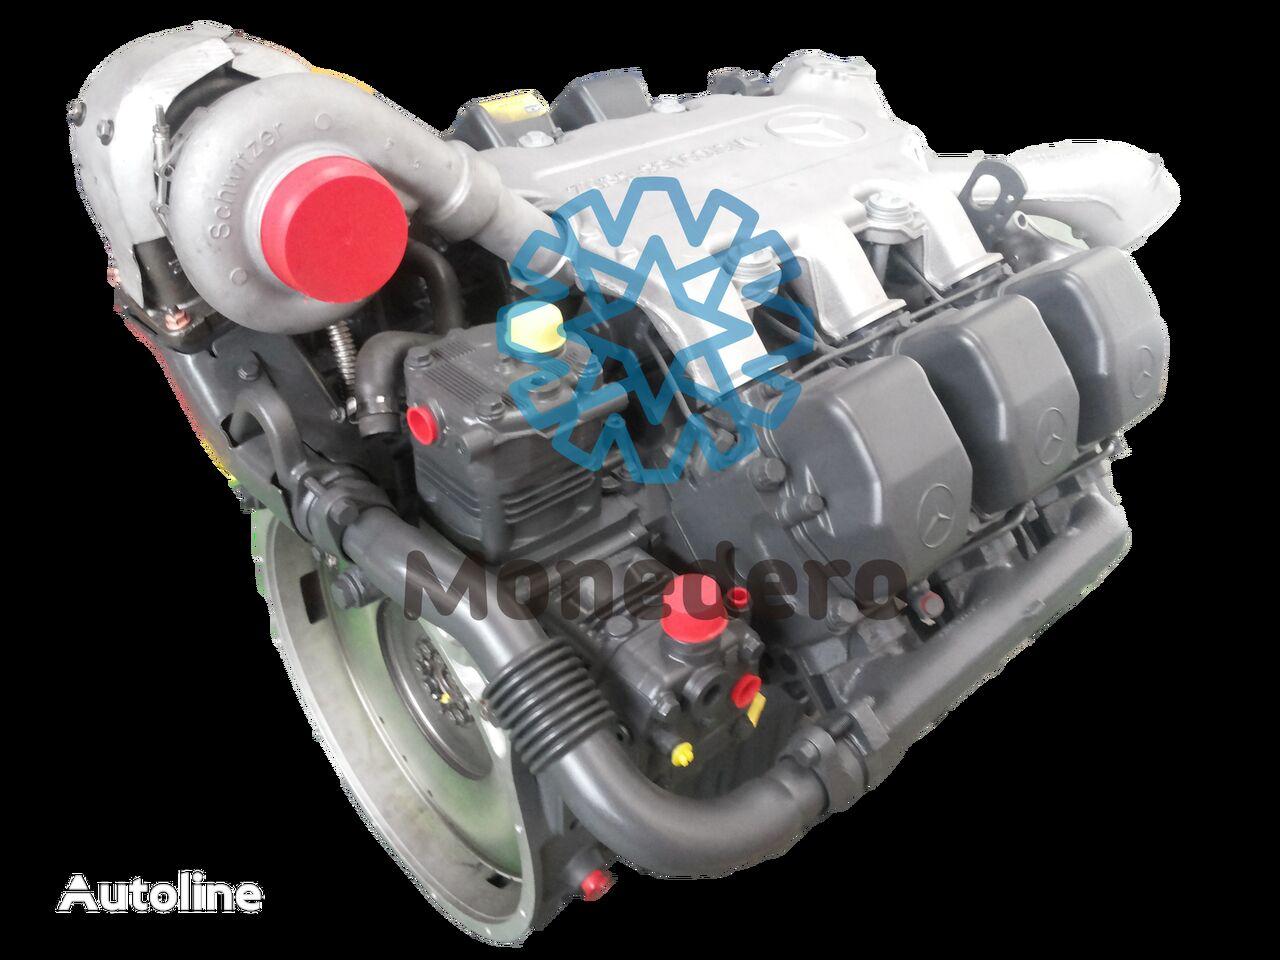 Mercedes Benz OM 501 LA motor pentru camion